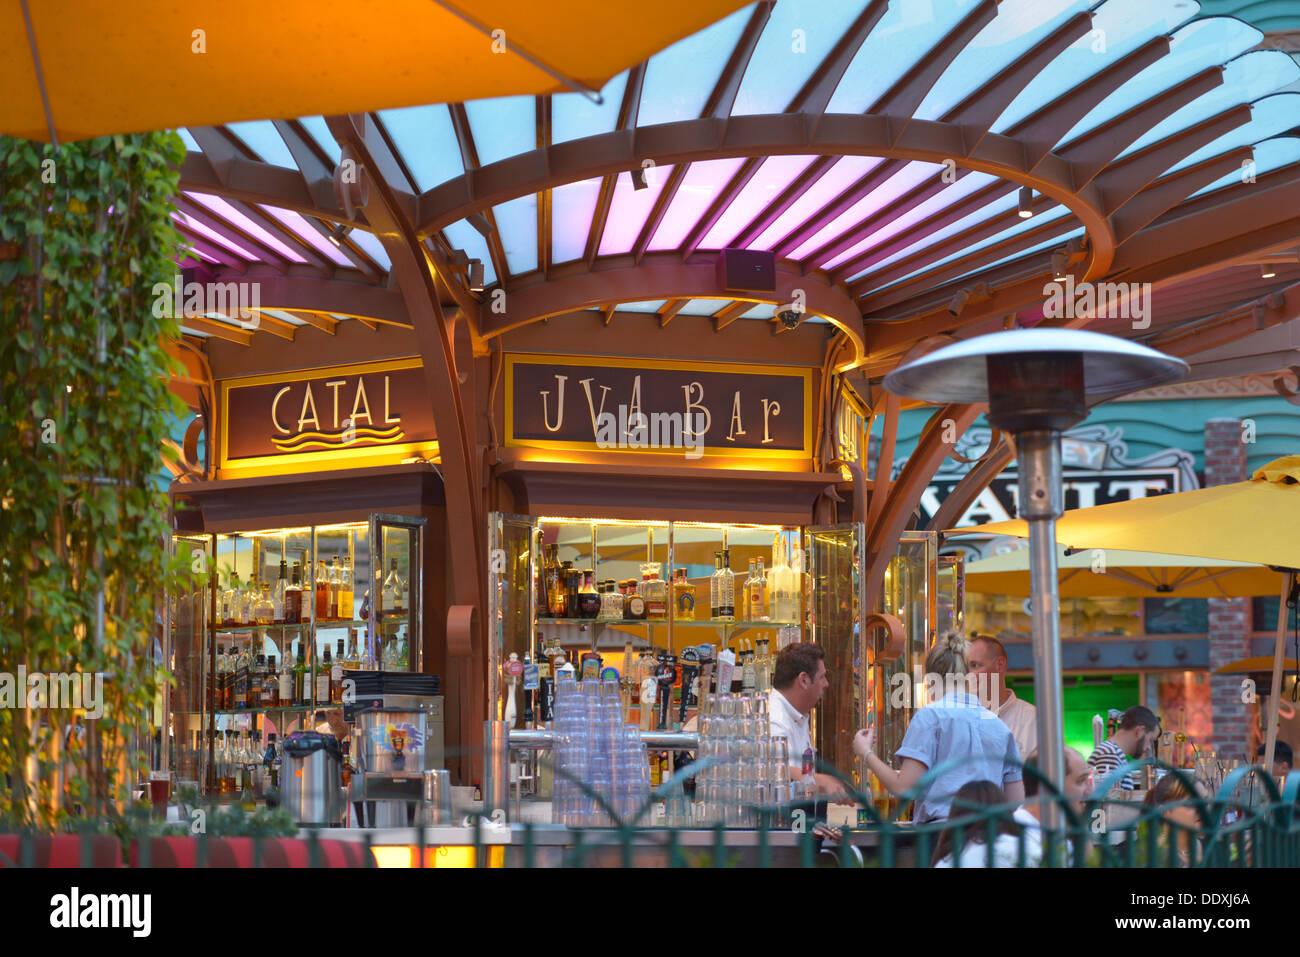 Disneyland, Downtown Disney, Catal Restaurant & Uva Bar, Anaheim, California - Stock Image